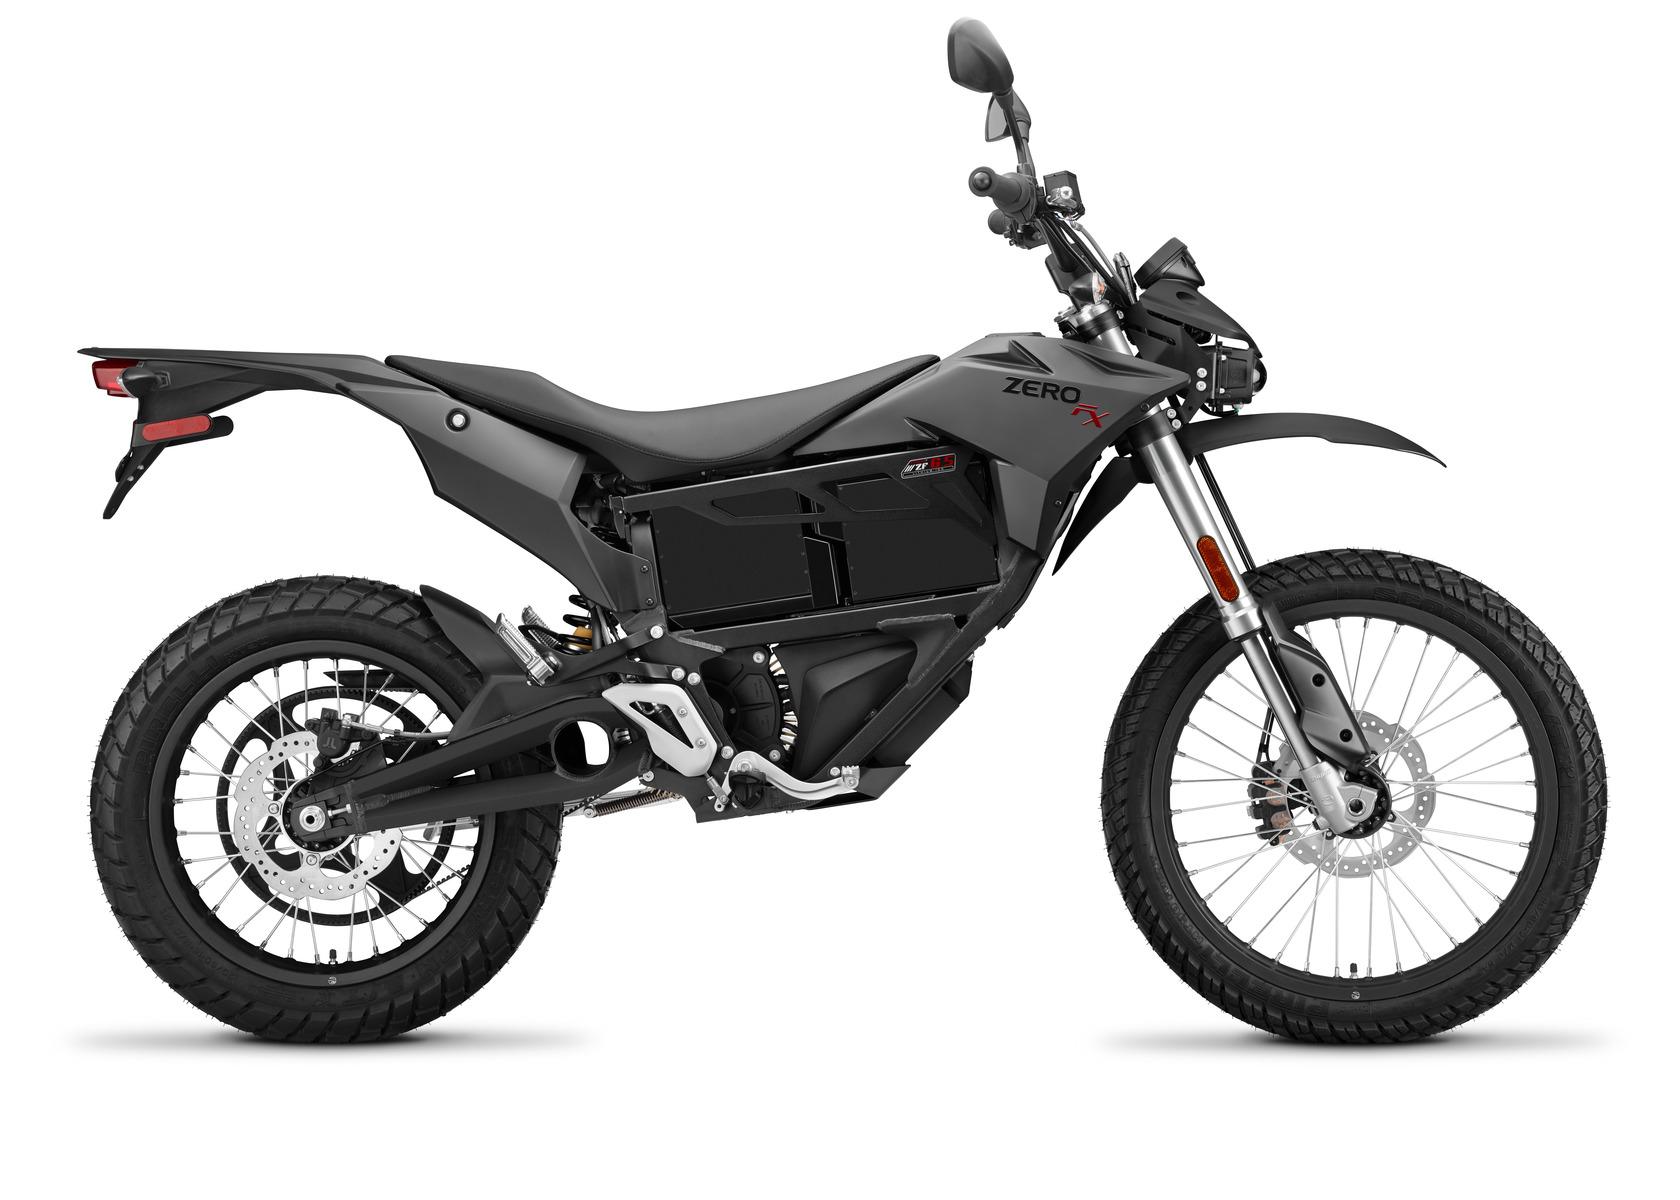 2016 Zero FX Electric Motorcycle: Black Profile Right, White Background